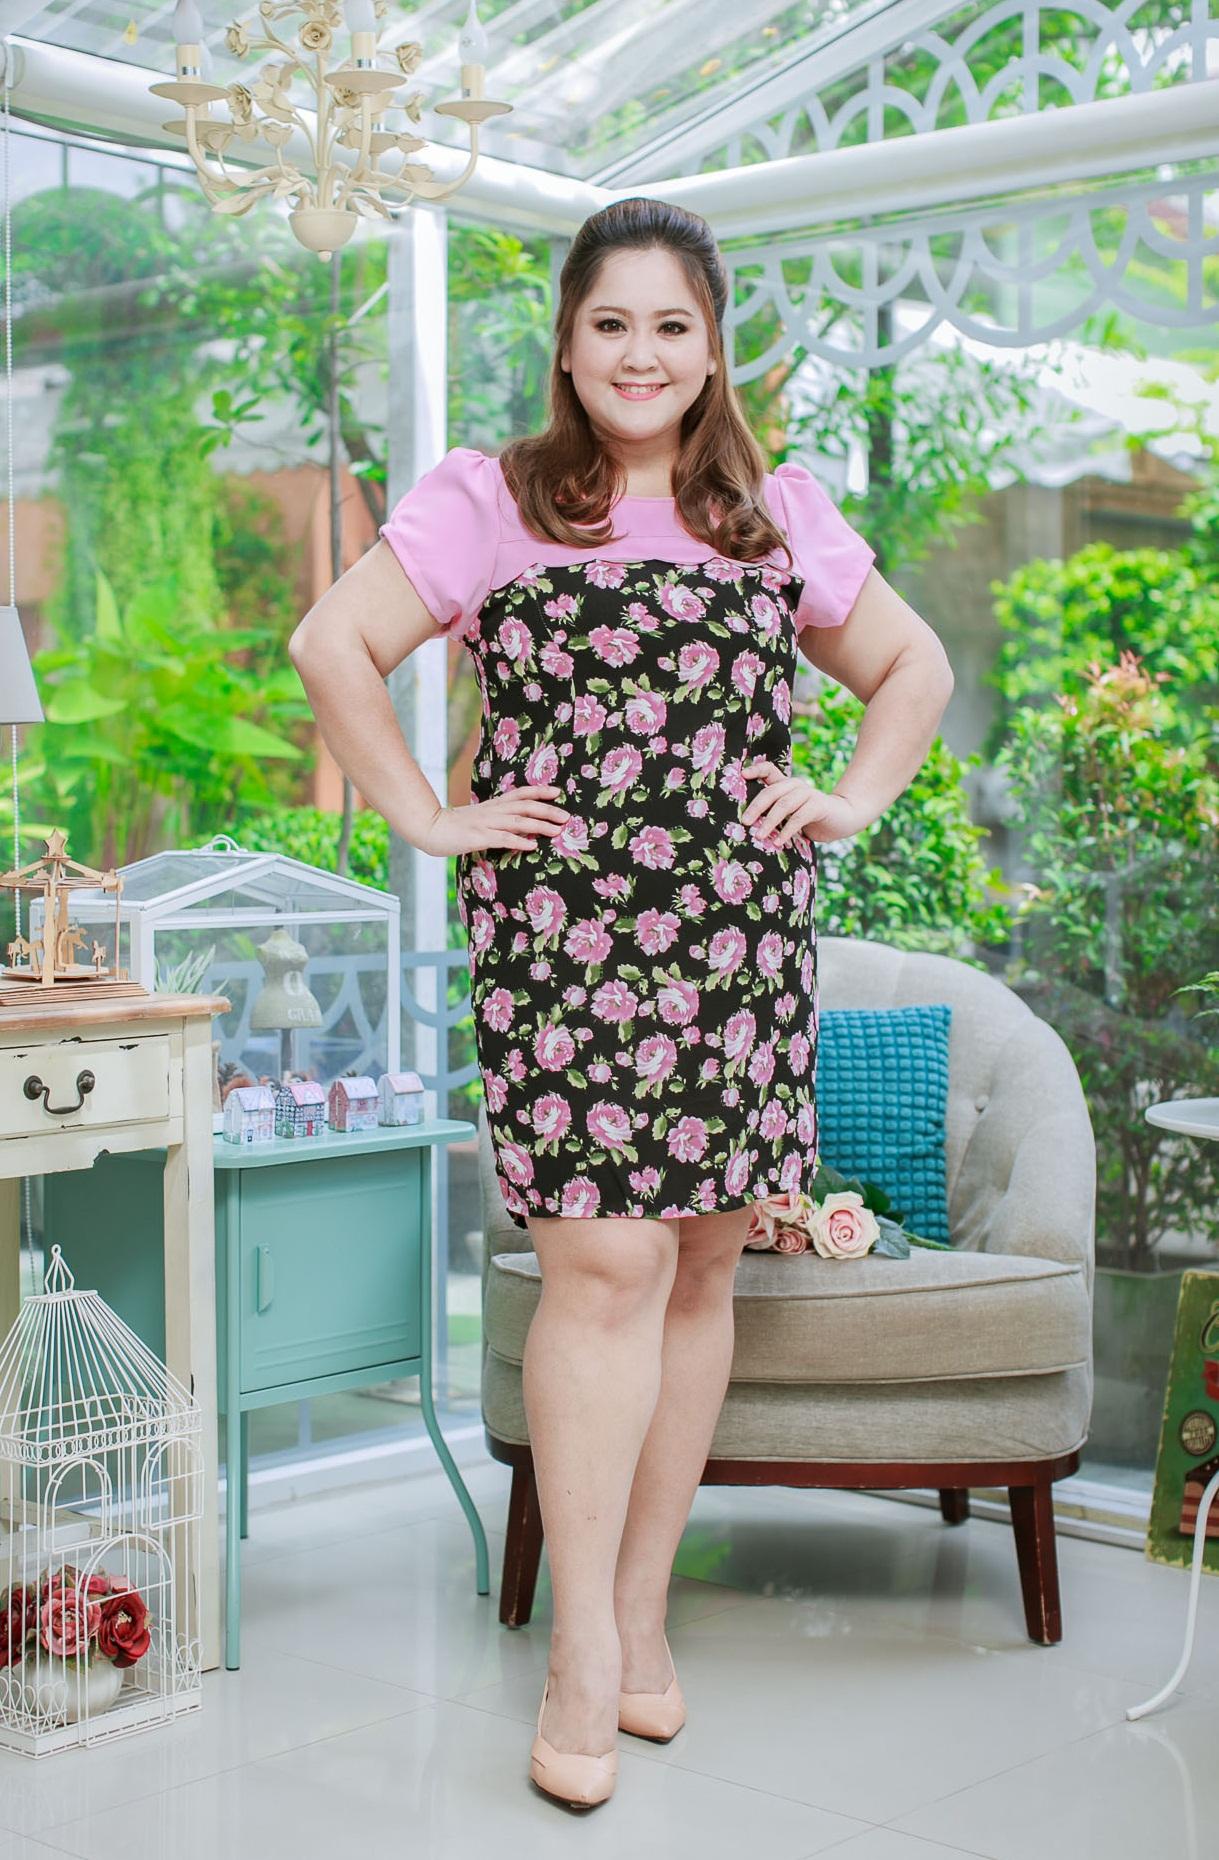 3 Size= XL,3XL,5XL ชุดเดรสสาวอวบ++ผ้า Sanfox พื้นดำ ทอลายดอกชมพู จุดเด่นของชุดนี้ตัดต่อด้านบน และแขนด้วยผ้า Hanako สีชมพู